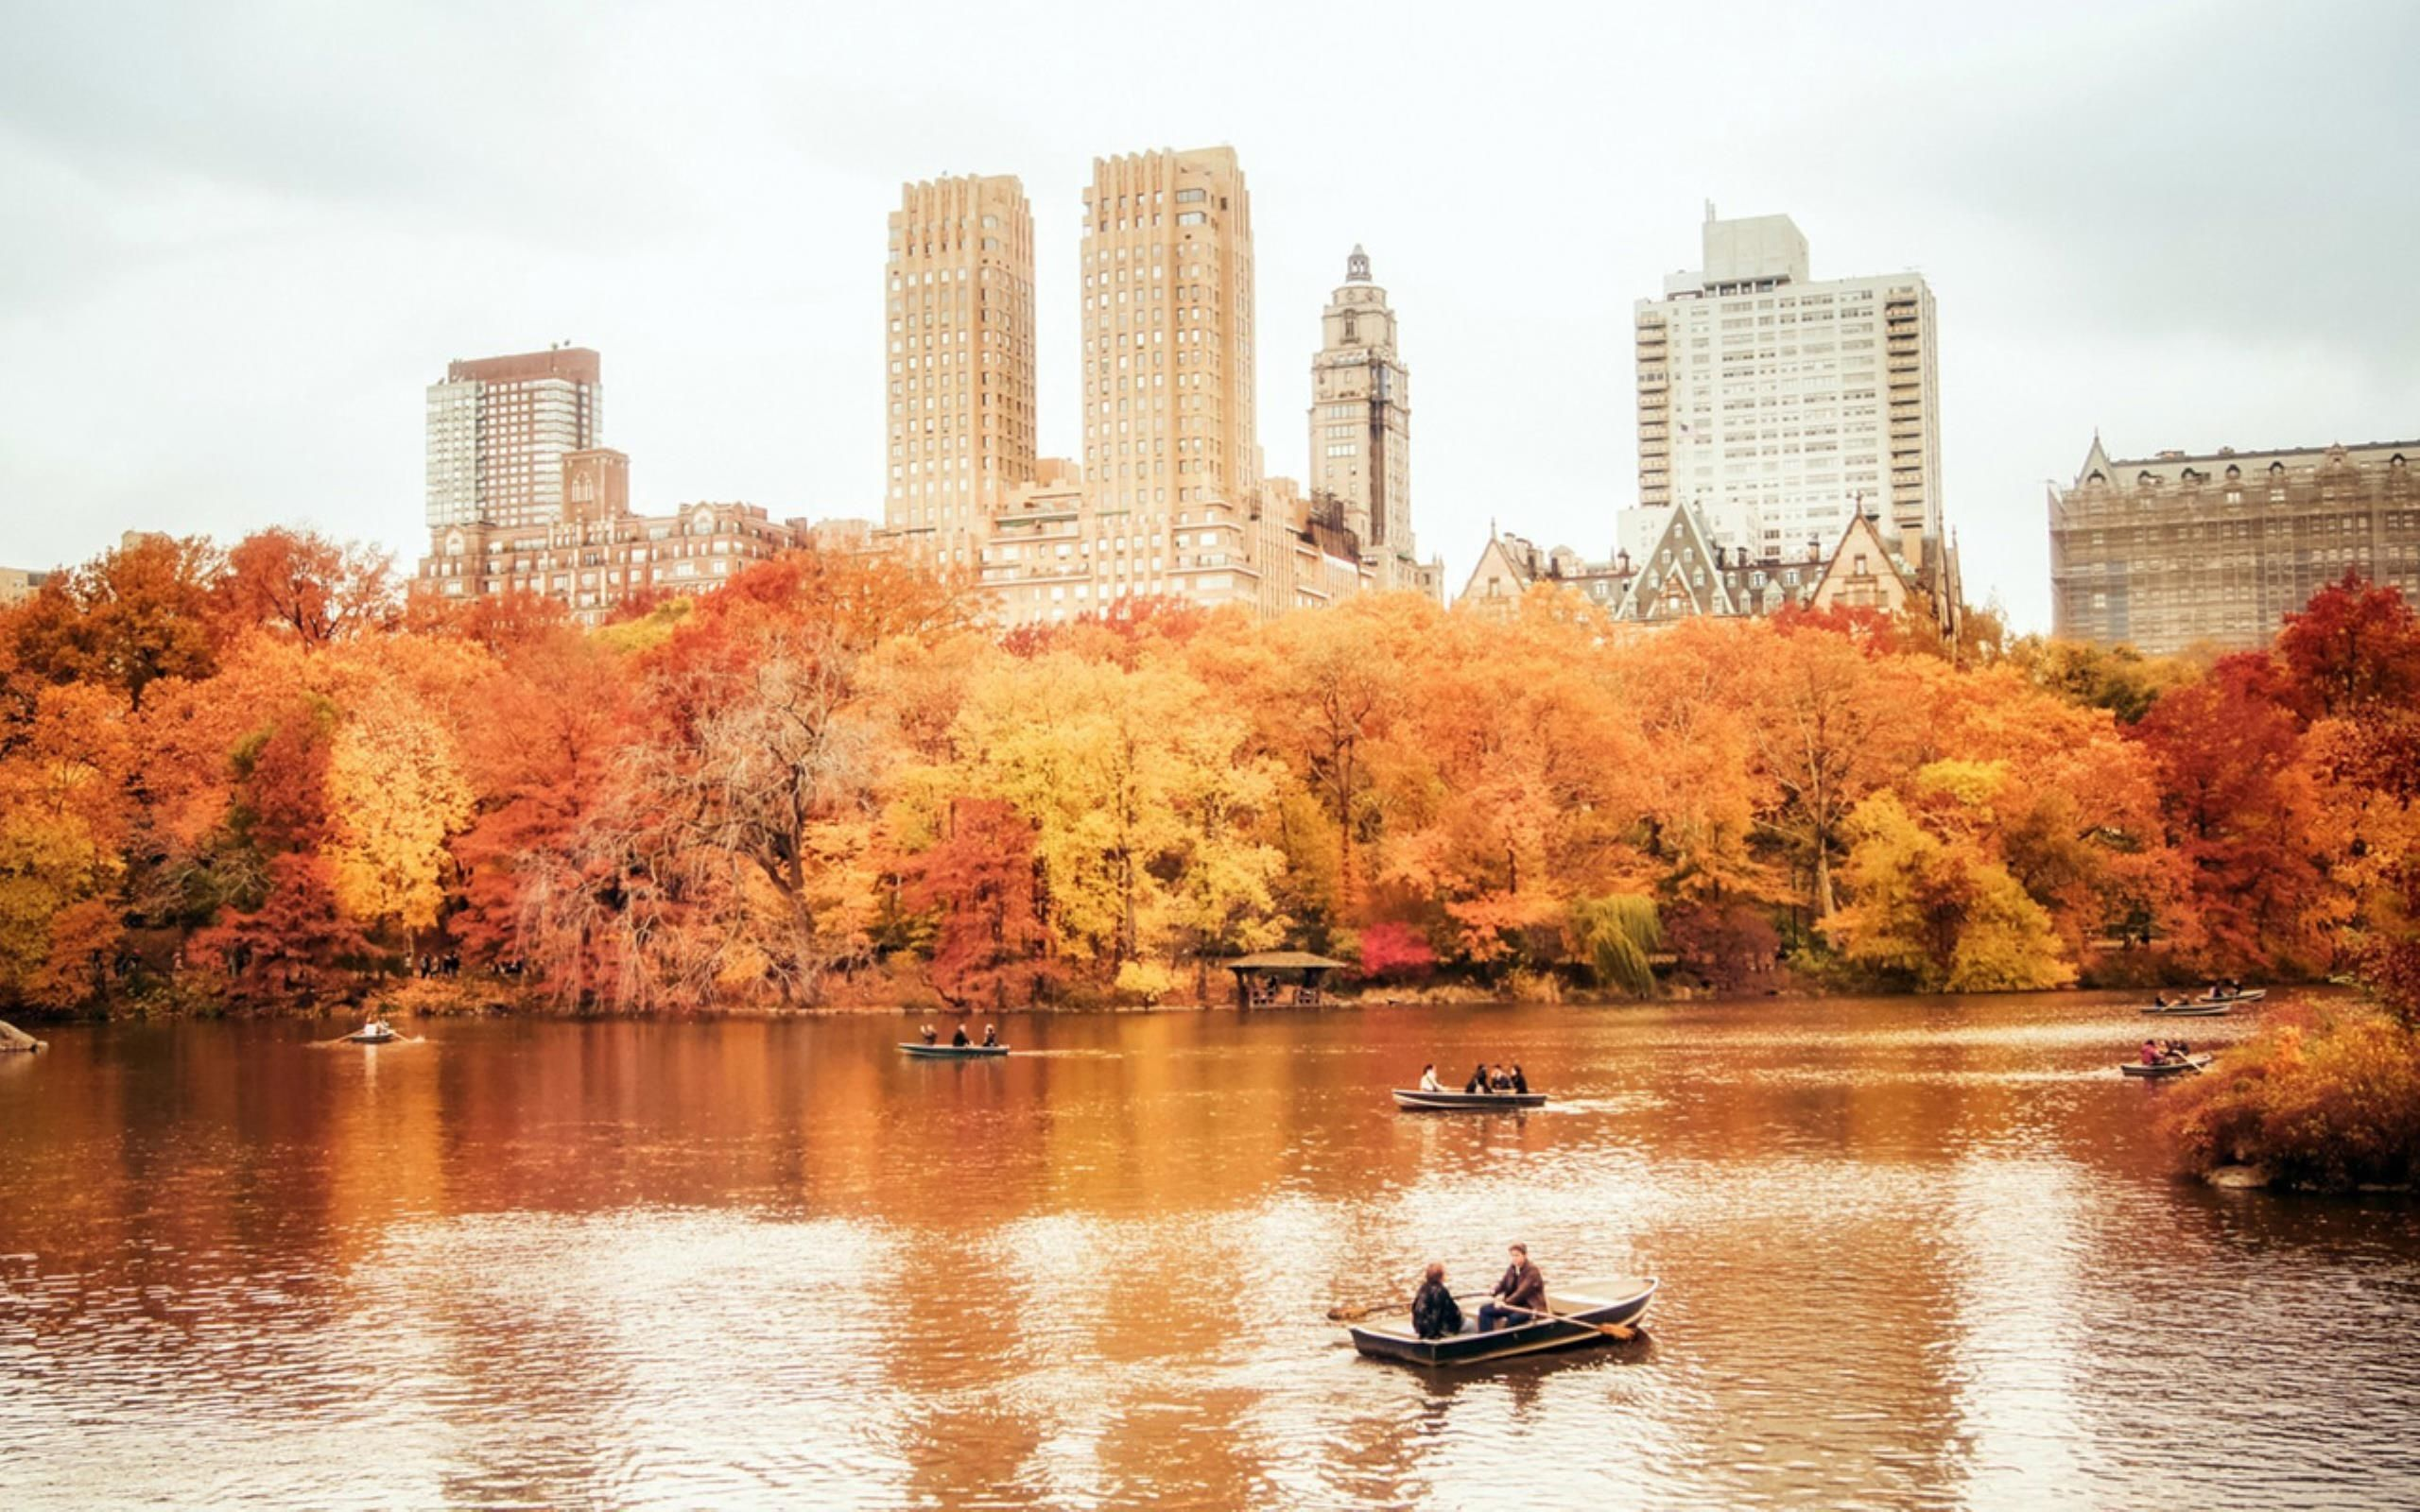 10 Latest Fall In New York Wallpaper Full Hd 1920 1080 For Pc Desktop New York City Central Park Autumn In New York New York Central